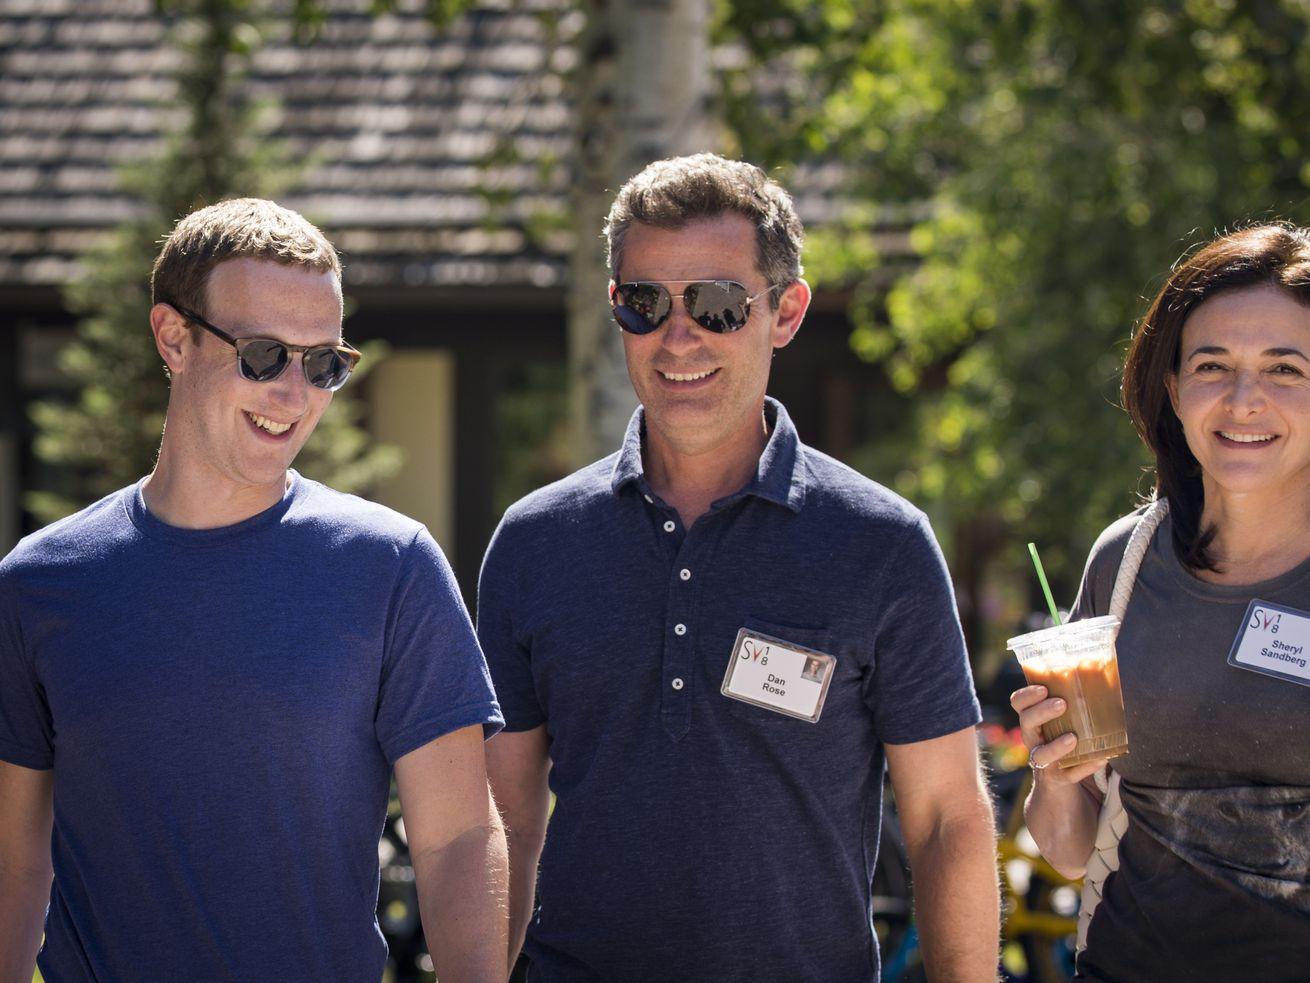 Facebook首席执行官马克·扎克伯格,离开了,谢乐尔•桑德伯格(Sheryl Sandberg)副总裁Dan玫瑰和首席运营官